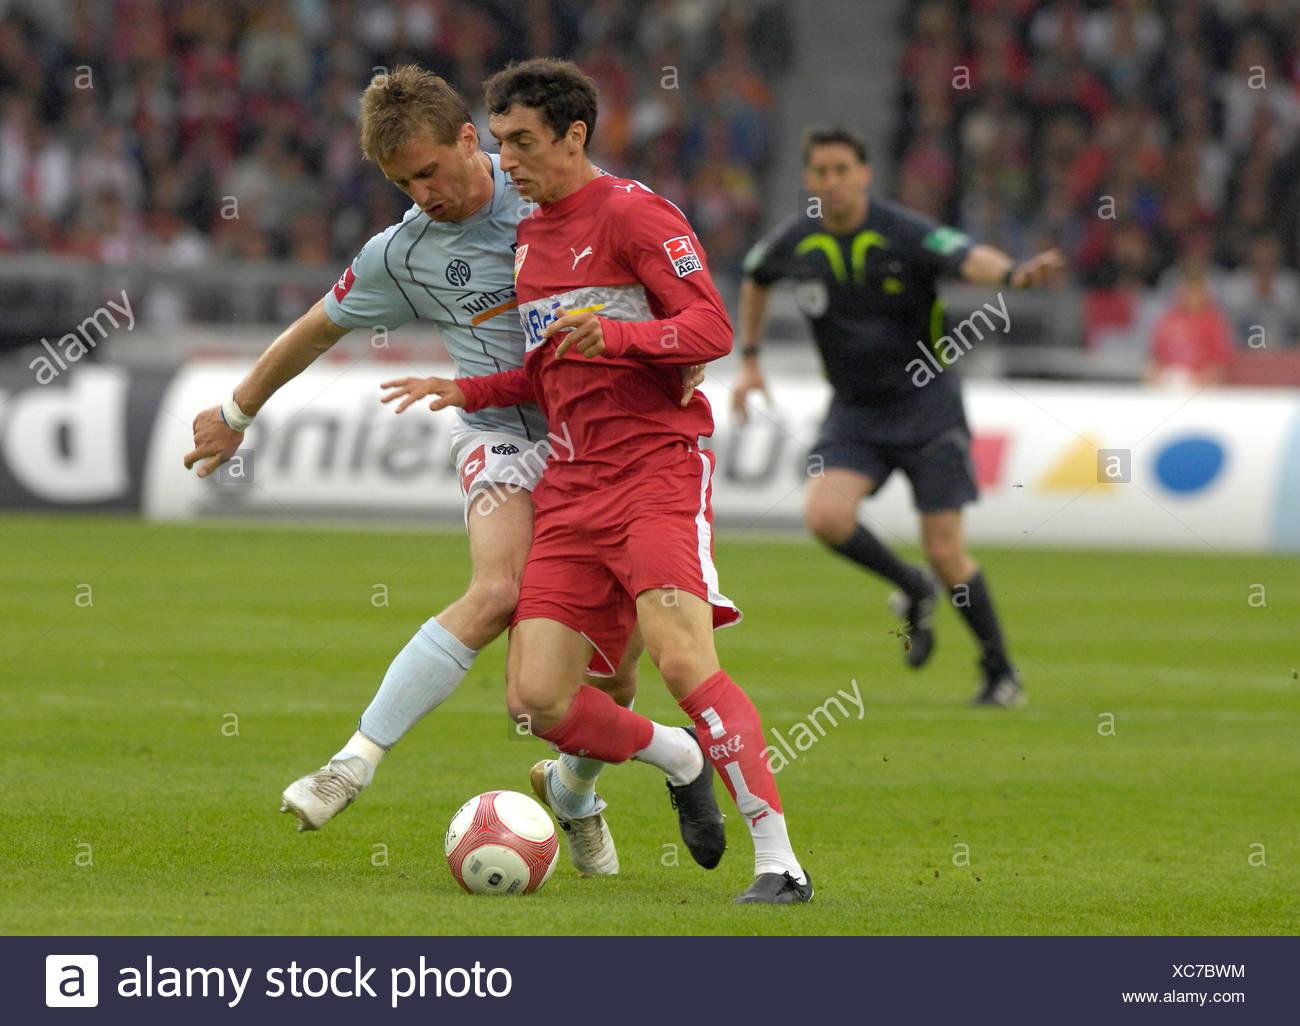 Milorad PEKOVIC FSV Mainz 05 (right) vs. Roberto HILBERT VfB Stuttgart - Stock Image